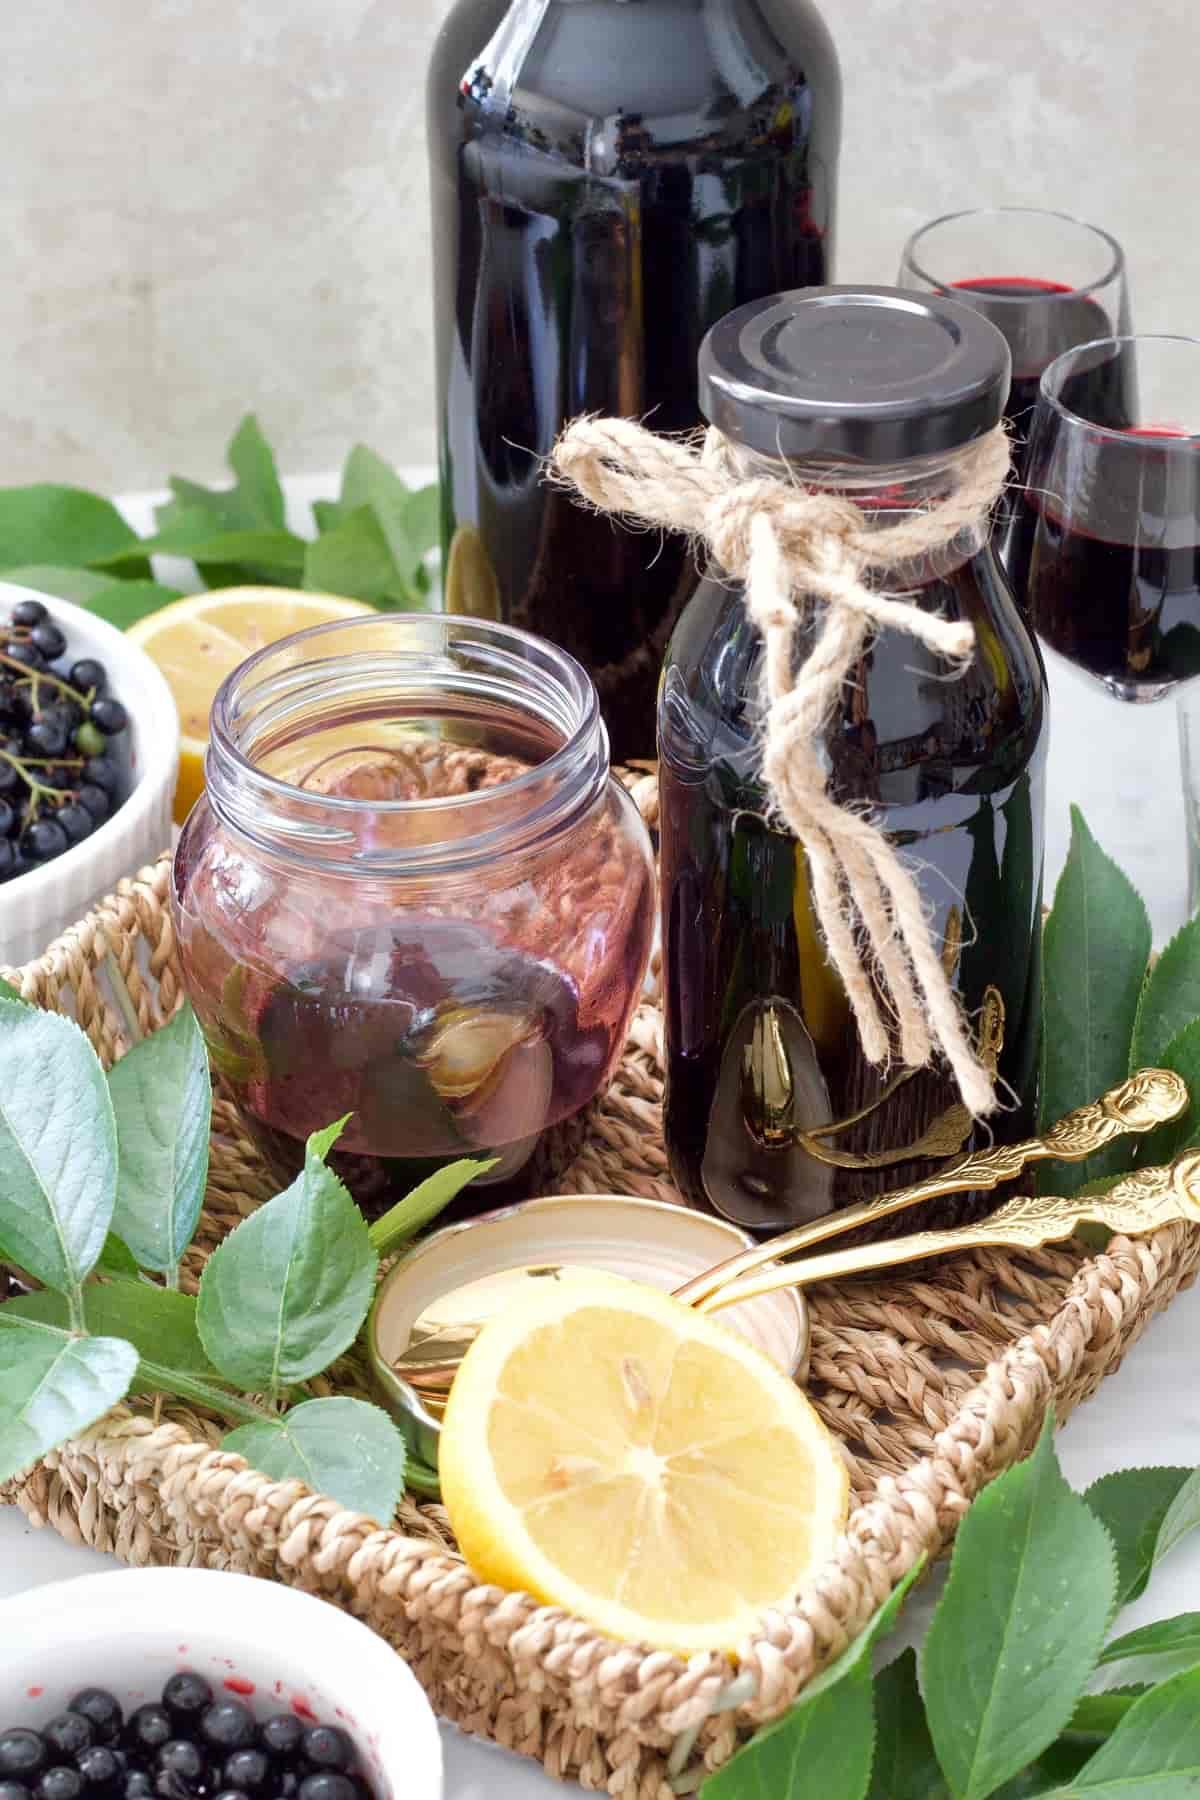 Open jar with elderberry syrup in a wicker tray.